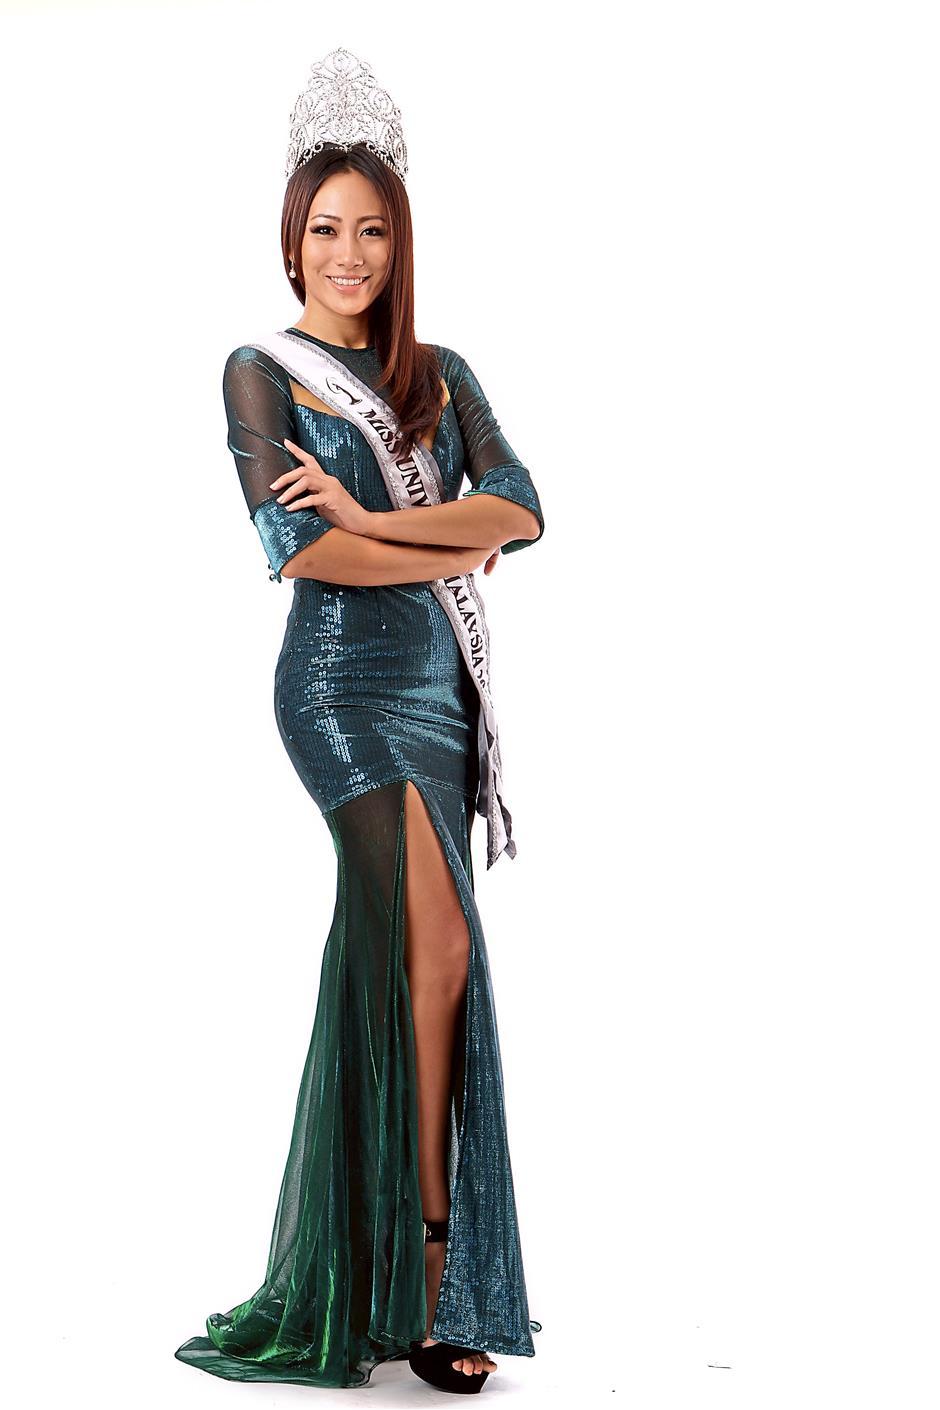 Miss Universe Malaysia 2015 Vanessa Tevi Kumares